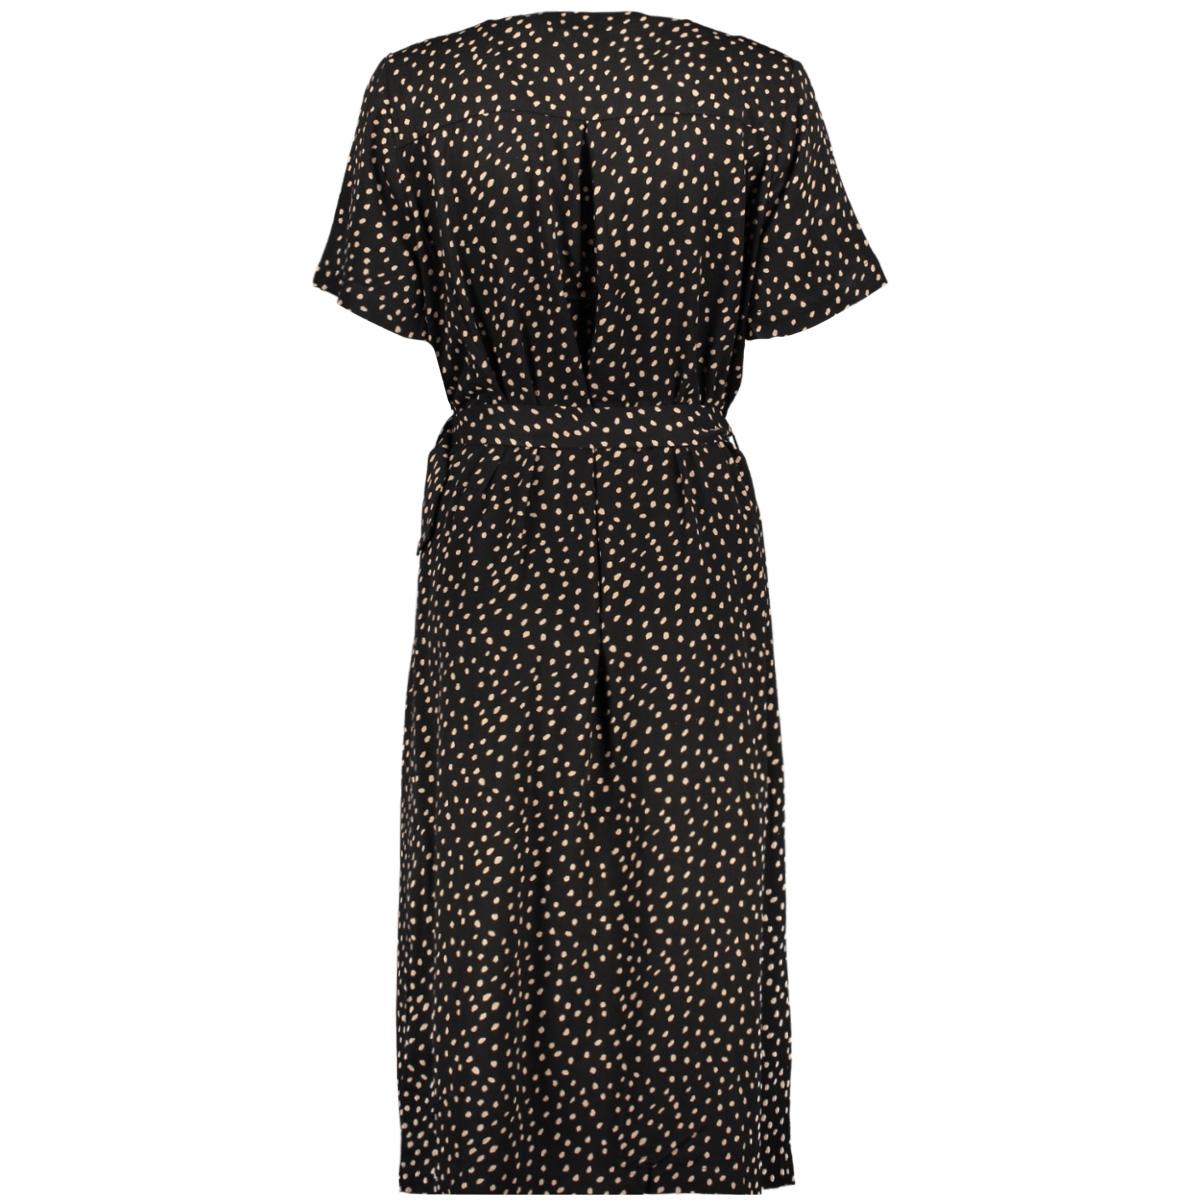 dreasz dot woven dress 30510121 saint tropez jurk 600058